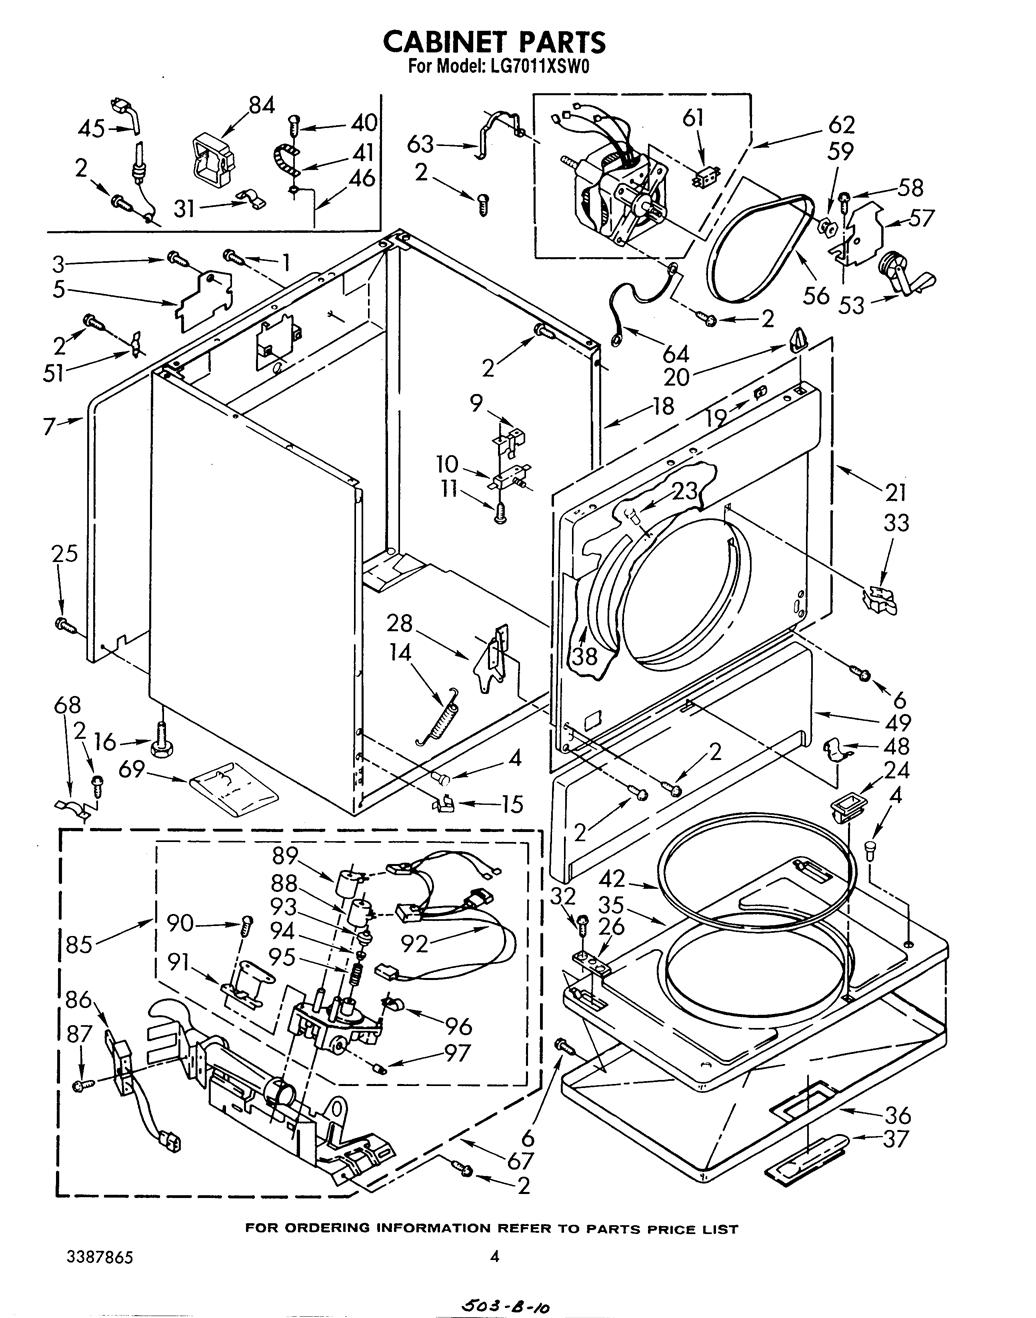 Whirlpool Lg Xsw0 Dryer Gas Valve Solenoid